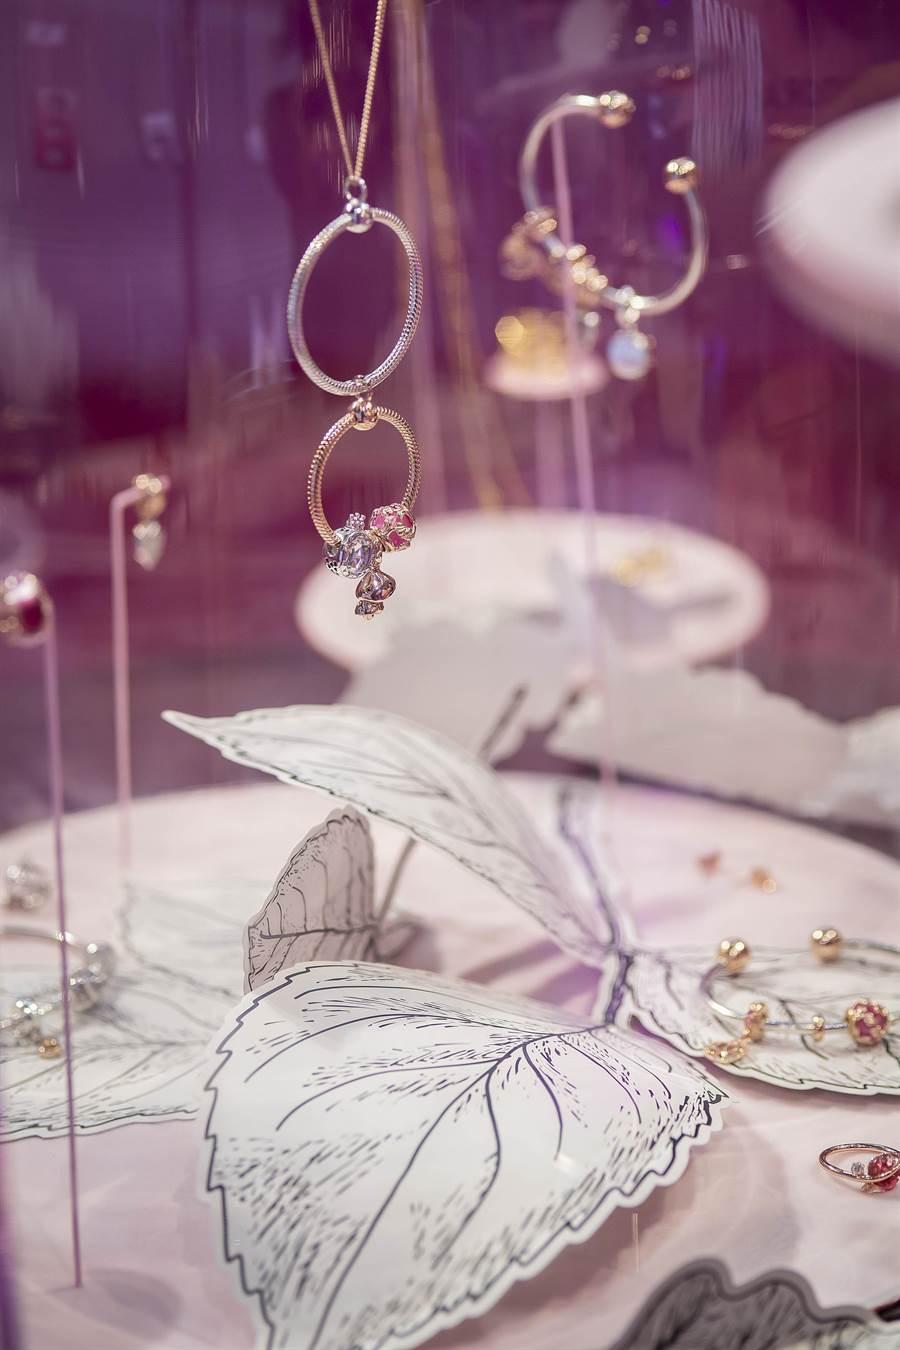 PANDORA在華山文創園區打造「#WhatDoYouLove」體驗展,以一片浪漫粉紅襯托珠寶之美。(PANDORA提供)